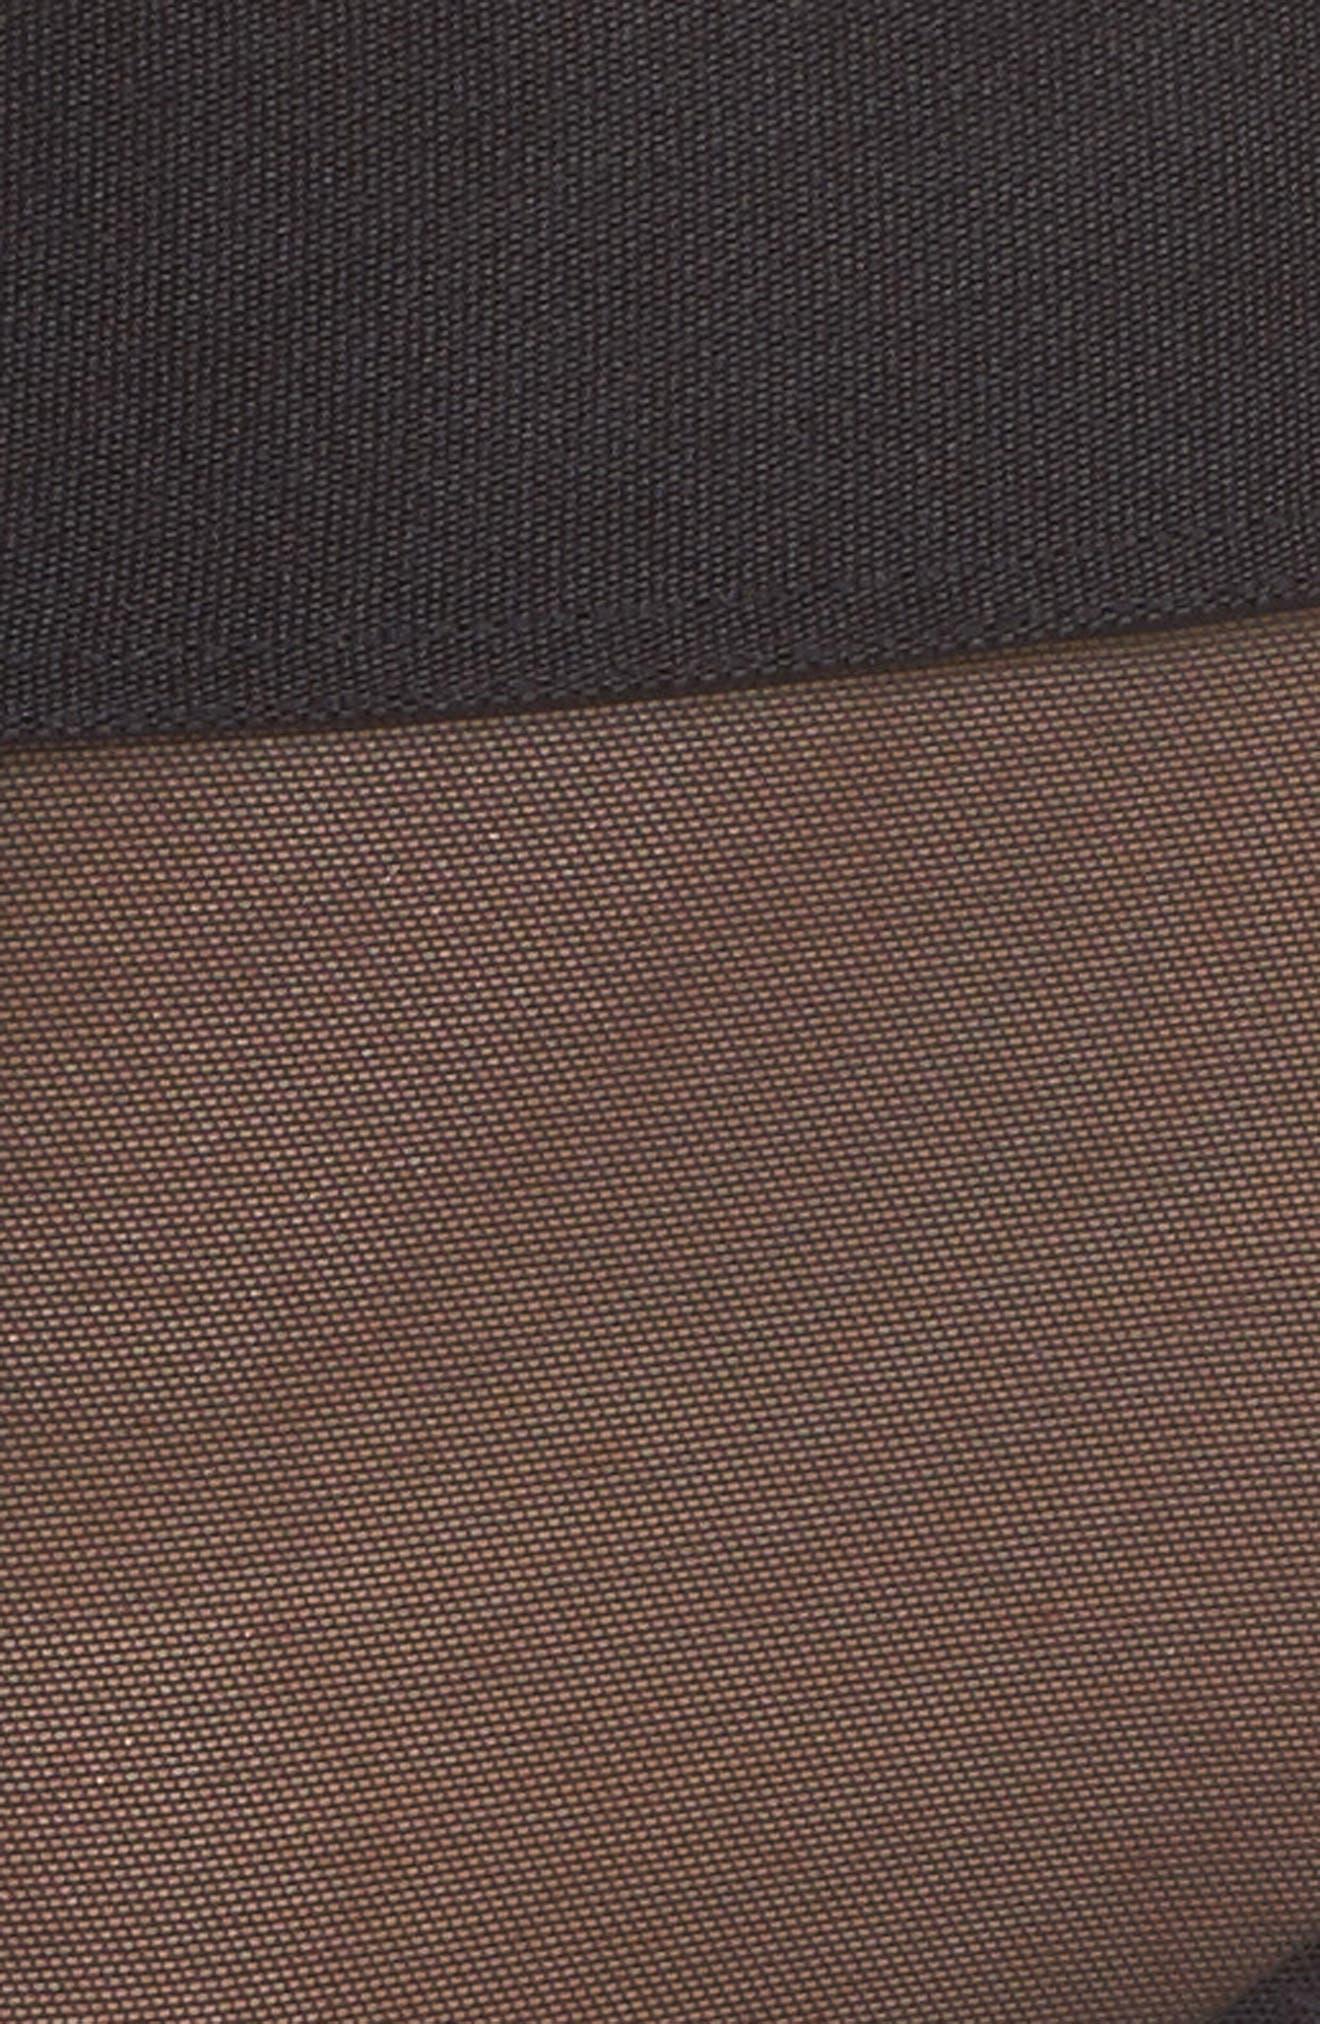 Sheers Thong,                             Alternate thumbnail 6, color,                             Black